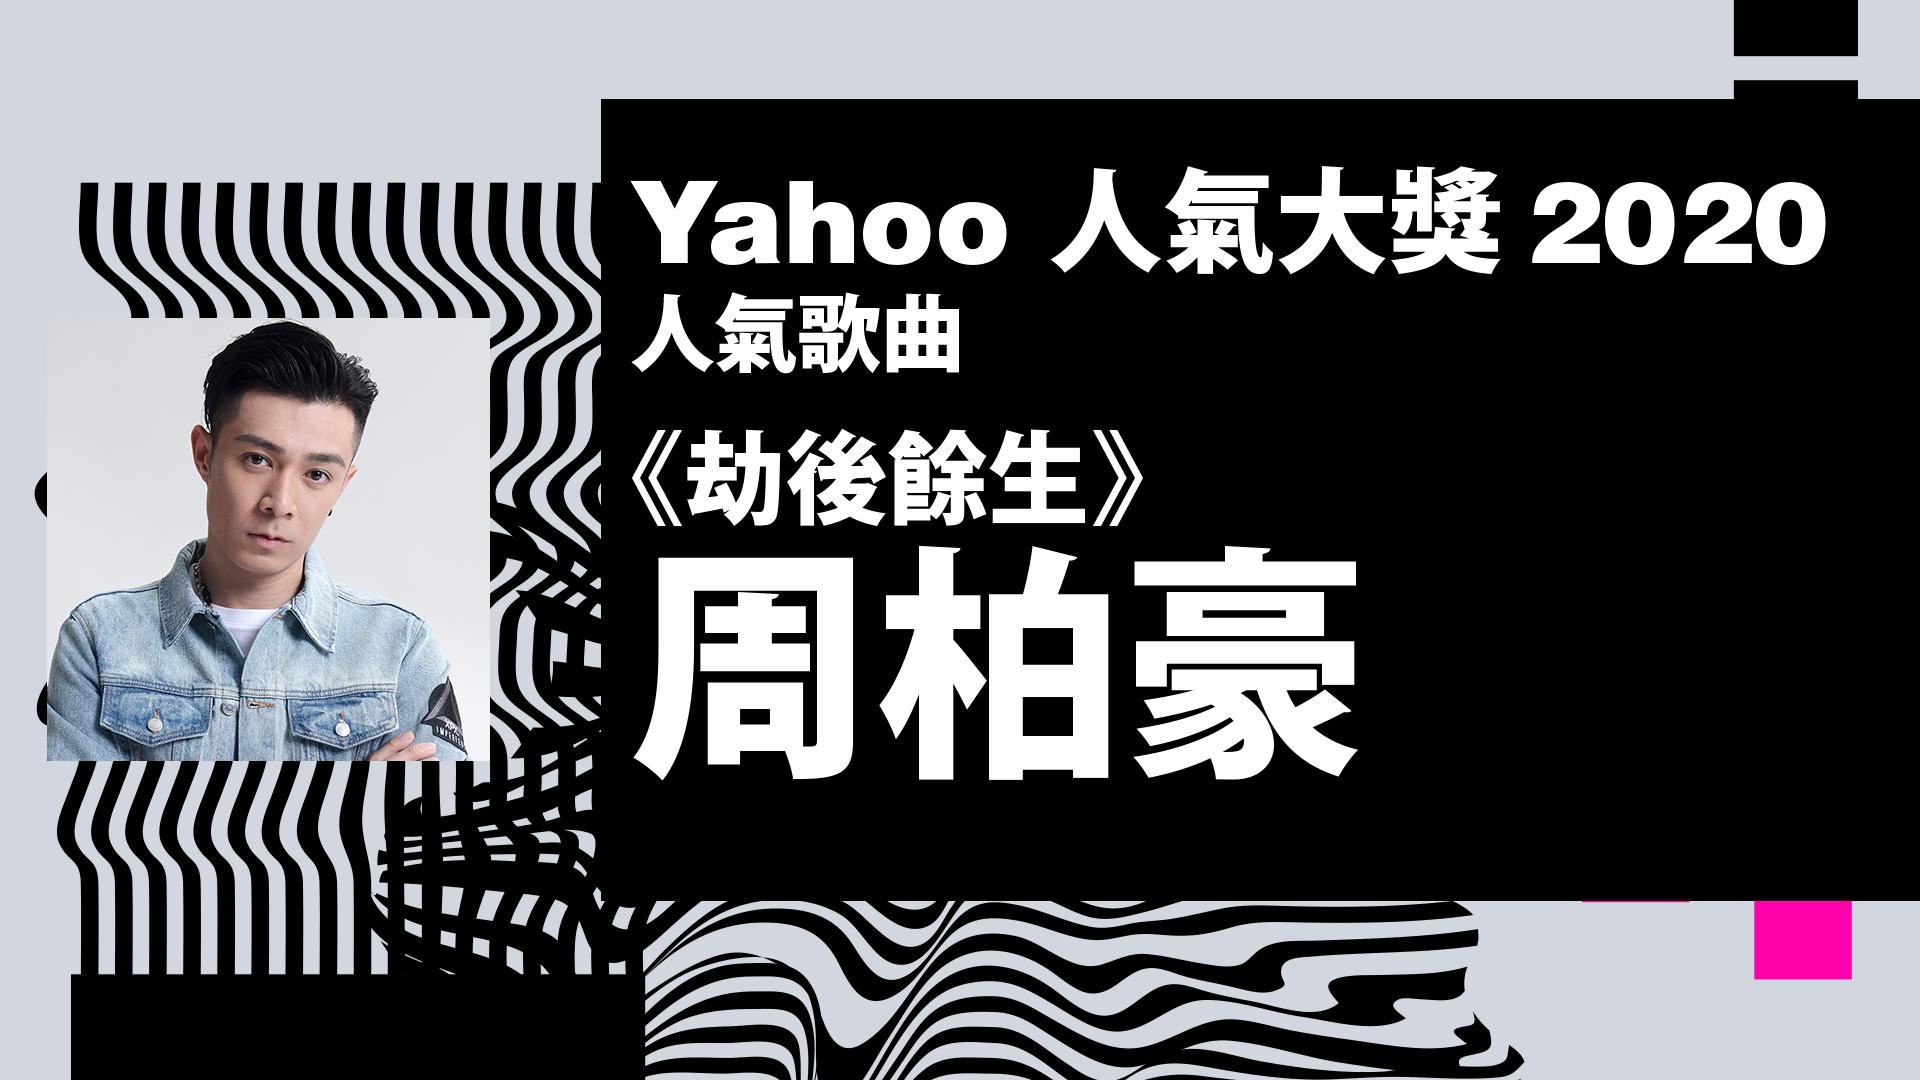 《Yahoo搜尋人氣大獎2020》人氣歌曲 |《劫後餘生》周柏豪